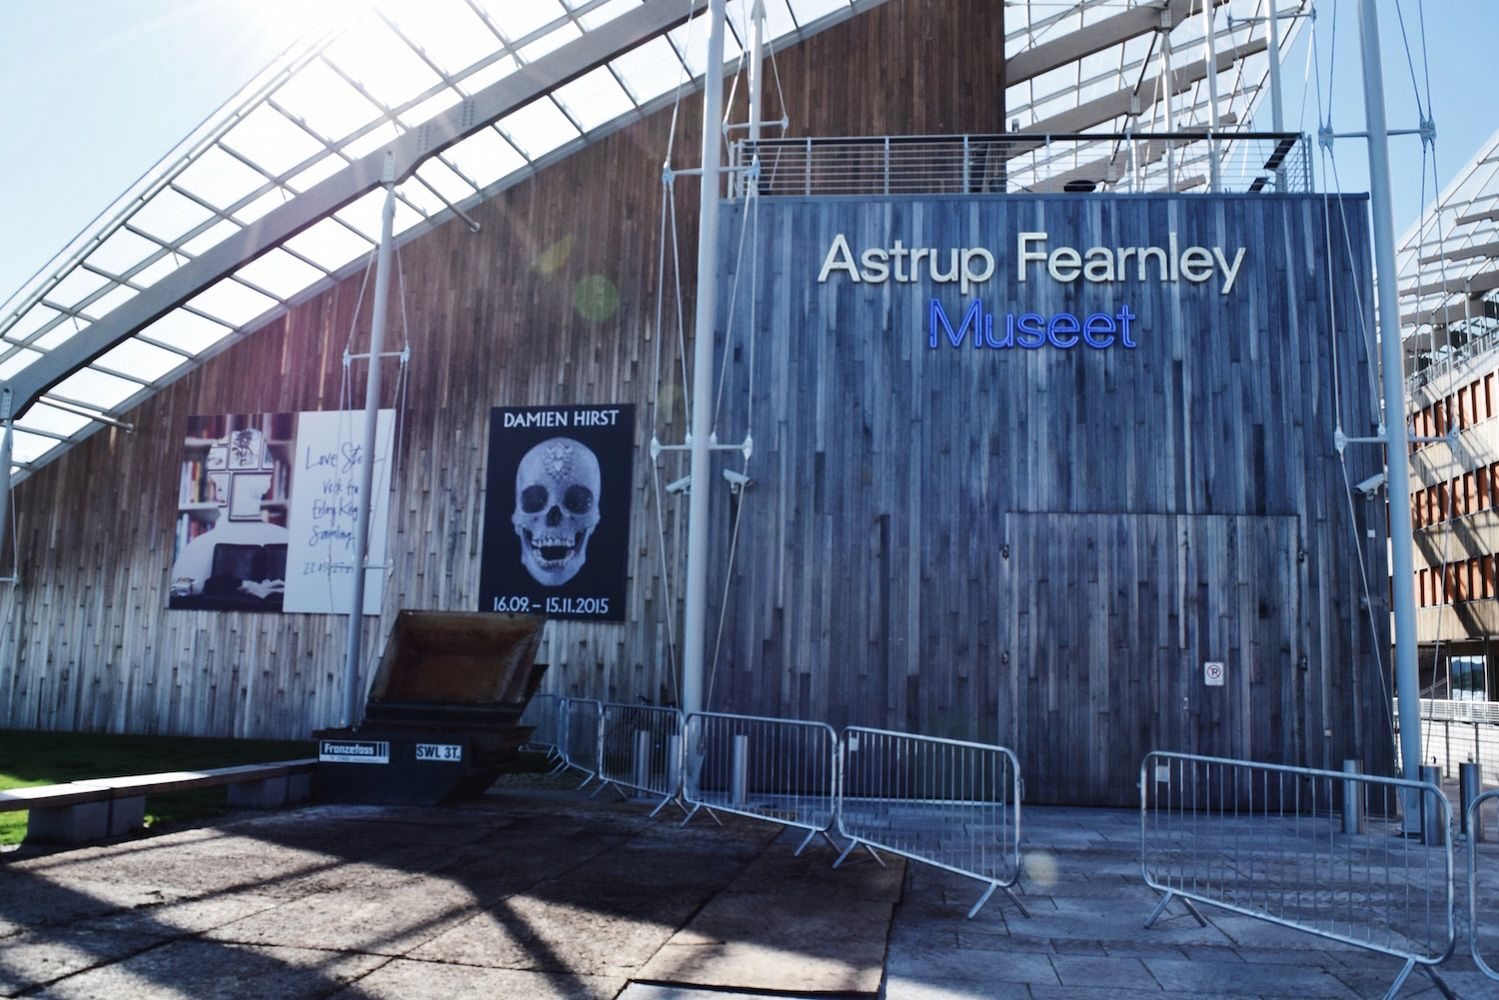 Astrup Fearnley Museet Building